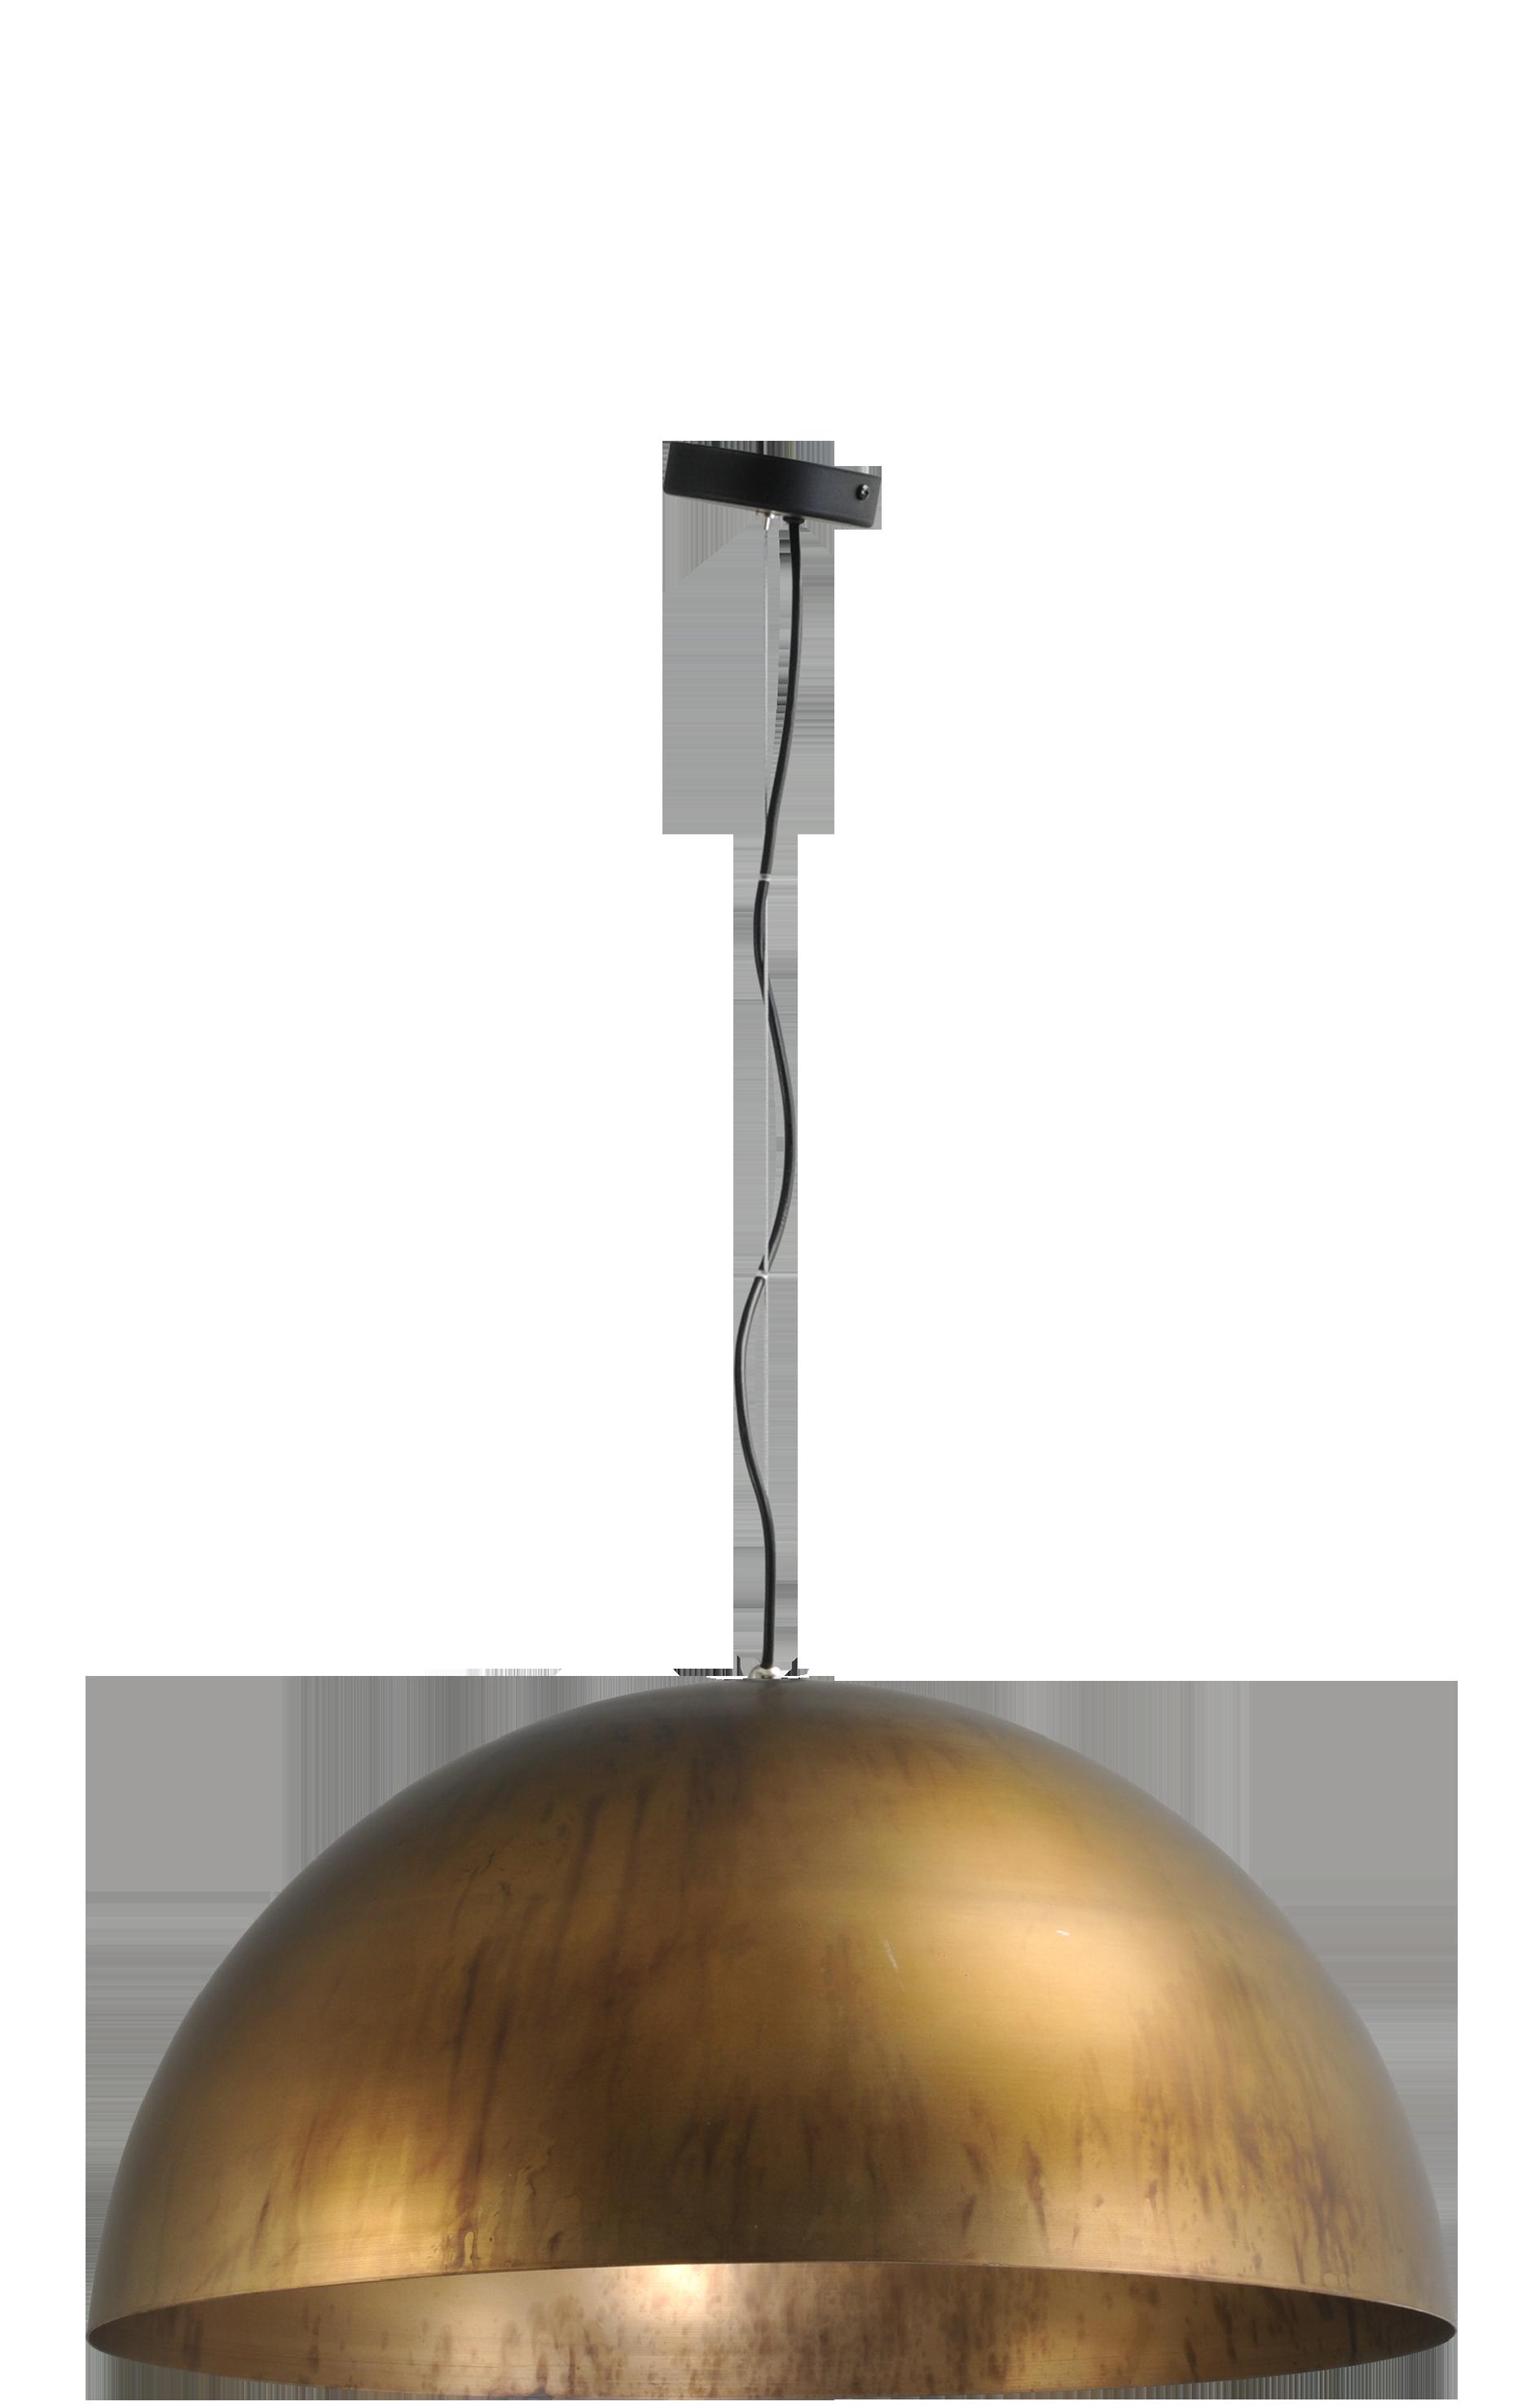 Larino Antique Brass HL LARINO Ø60CM ANTIQUE BRASS OUTSIDE